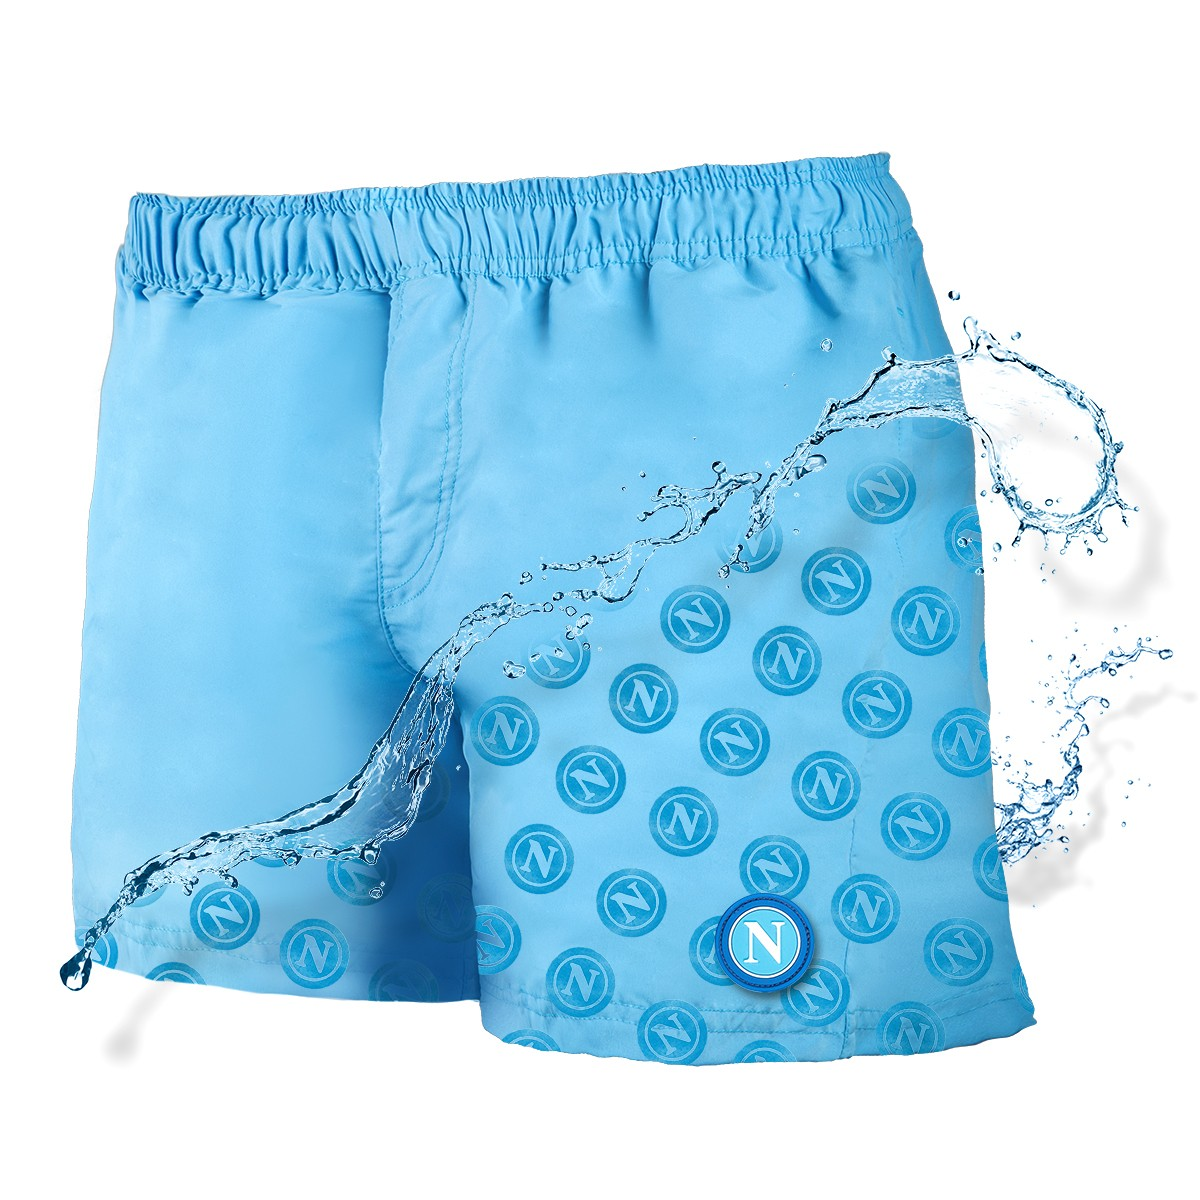 Sscn costume azzurro magic print loghi